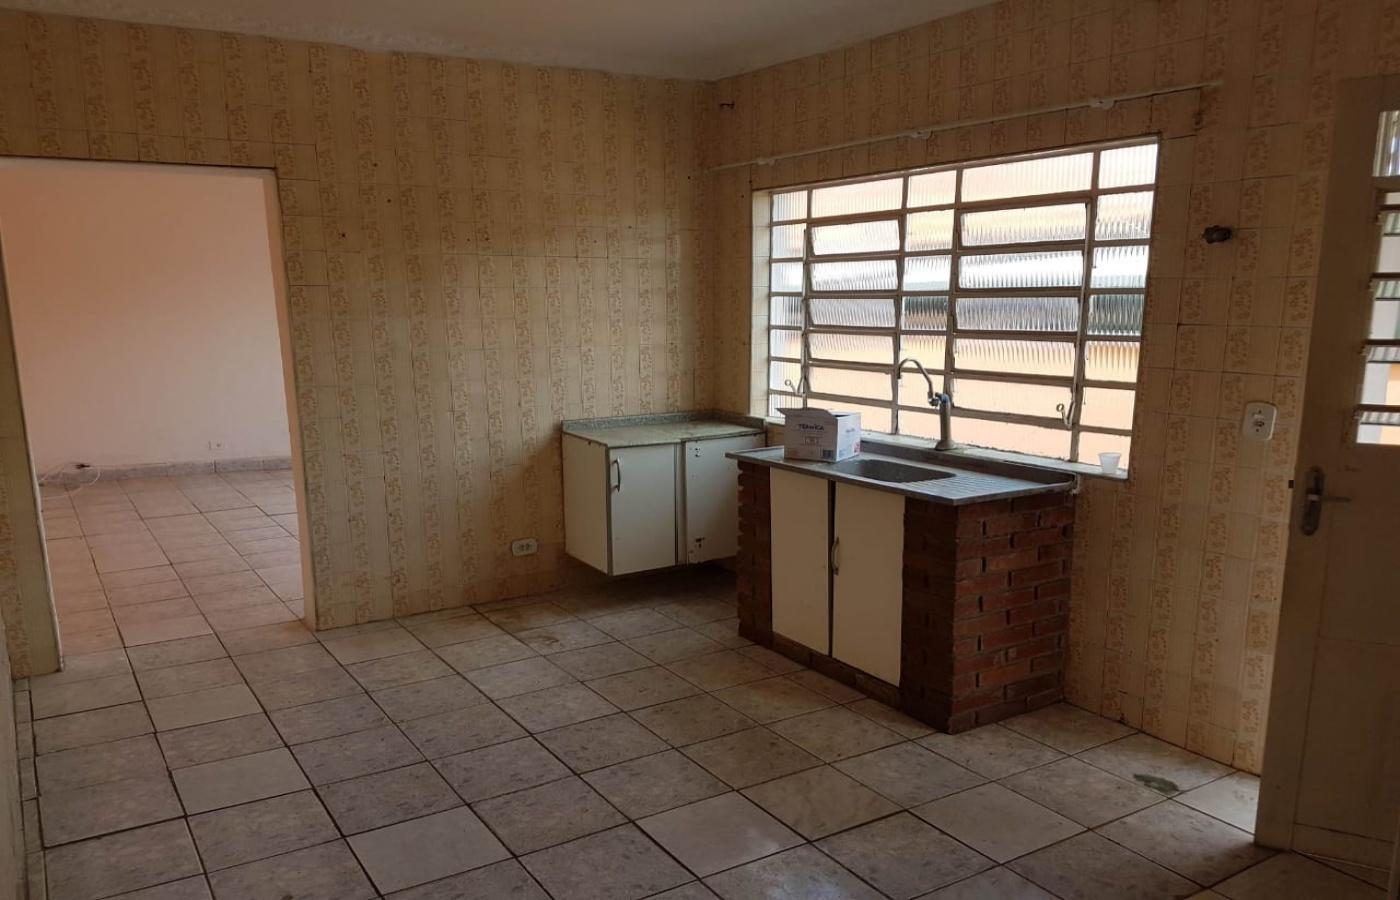 Rua Itinguçu Fundos, 03658-001, São Paulo 03658-001, ,Casa Térrea,Locações,Rua Itinguçu,1008